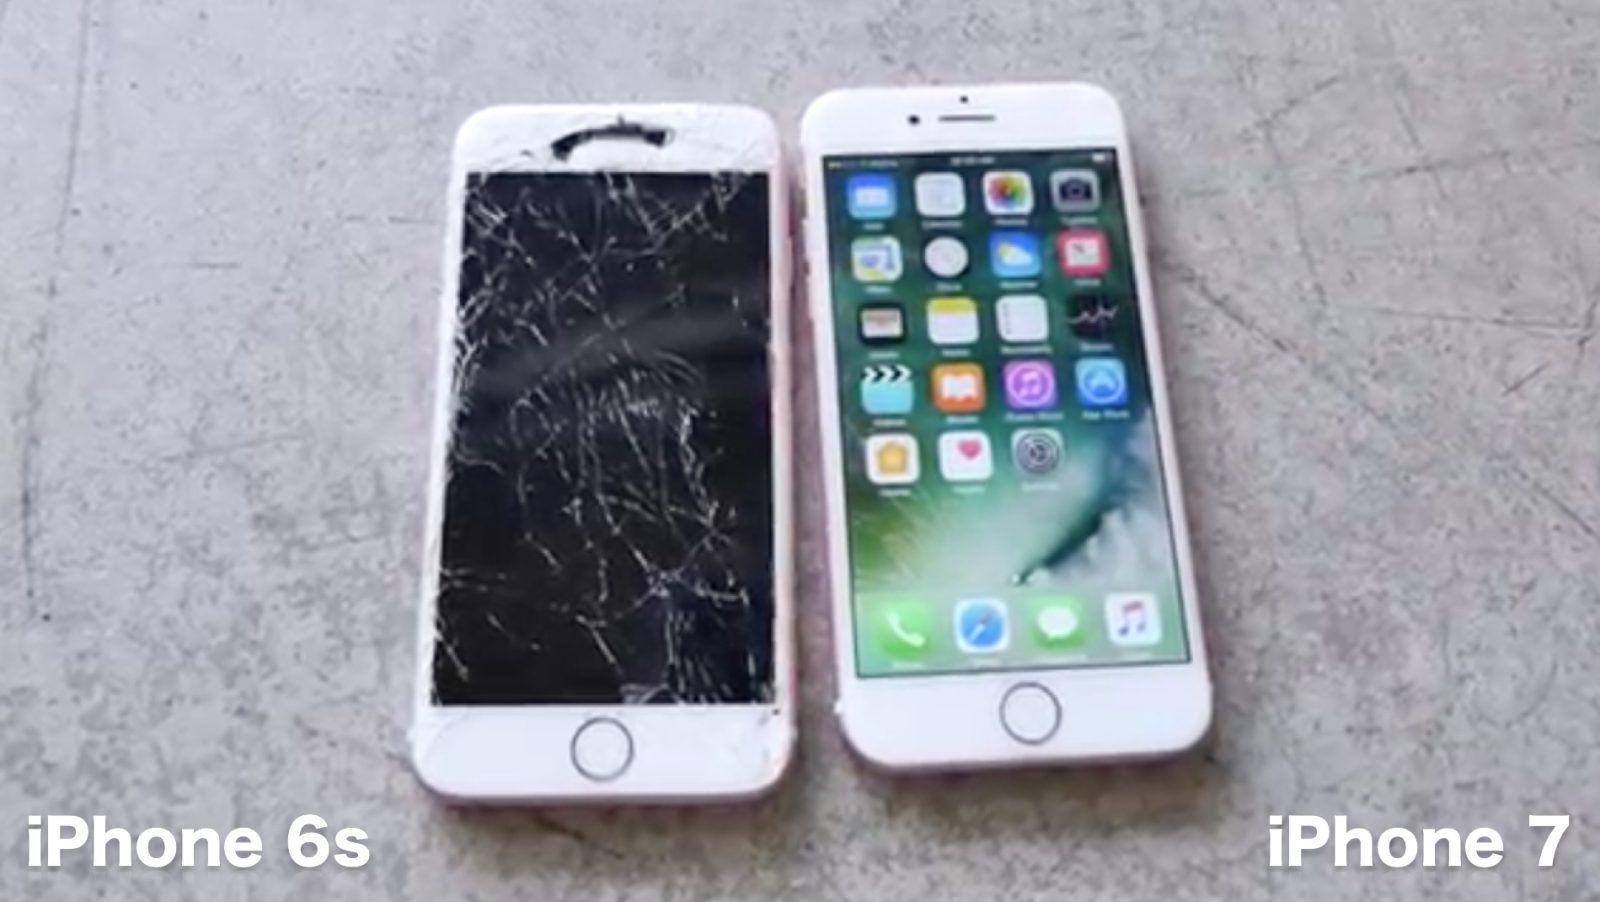 Iphone 7 Bests 6s In Durability Drop Test Survives Ten Foot Erapod Ipad Mac Face Down